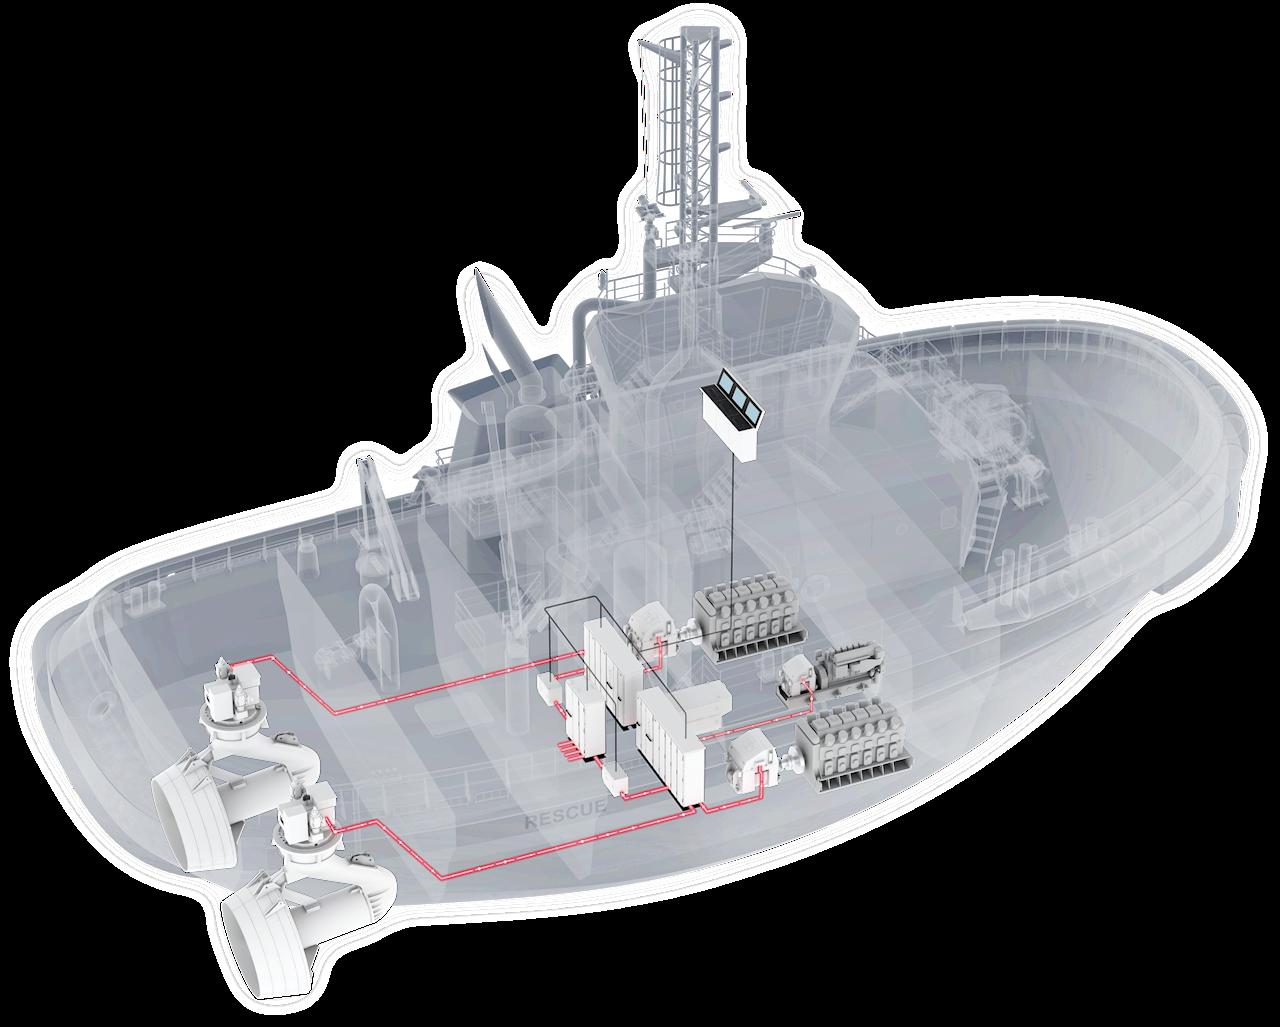 Tugboat illustration. Image credit ABB